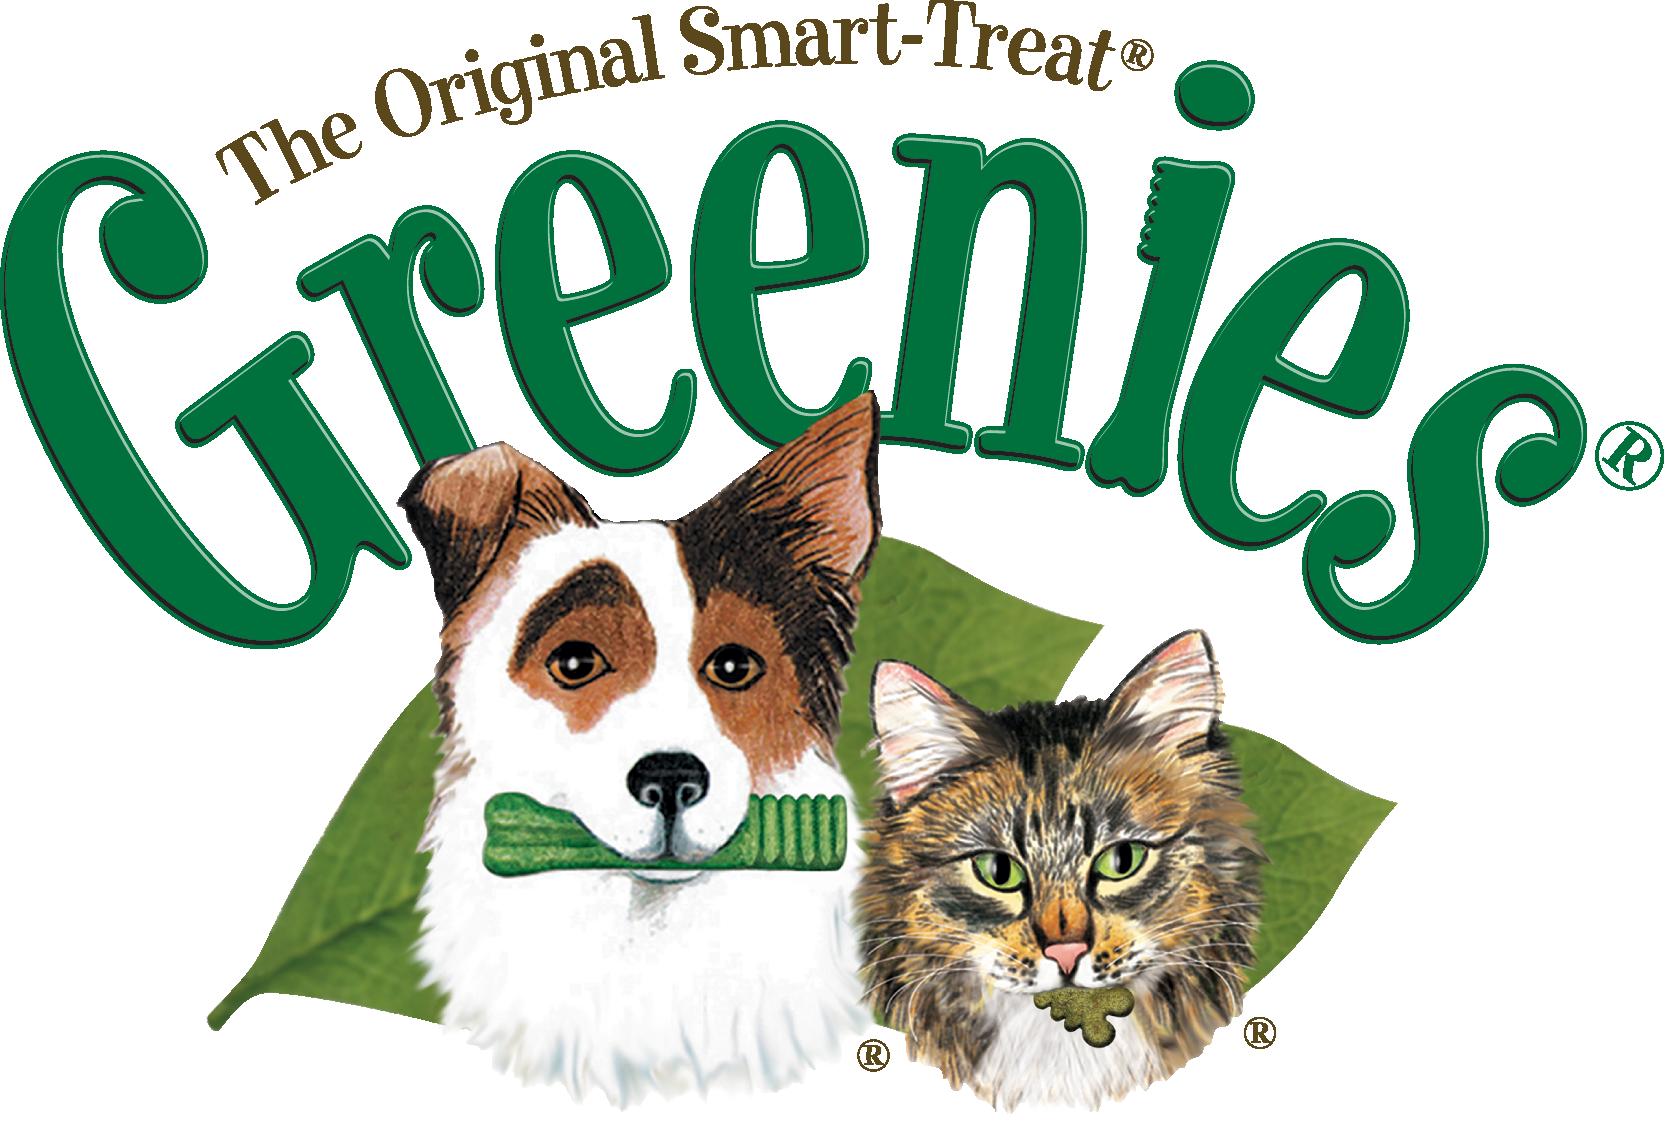 Amazon.com : Greenies Dental Chews for Dogs, Regular, Pack